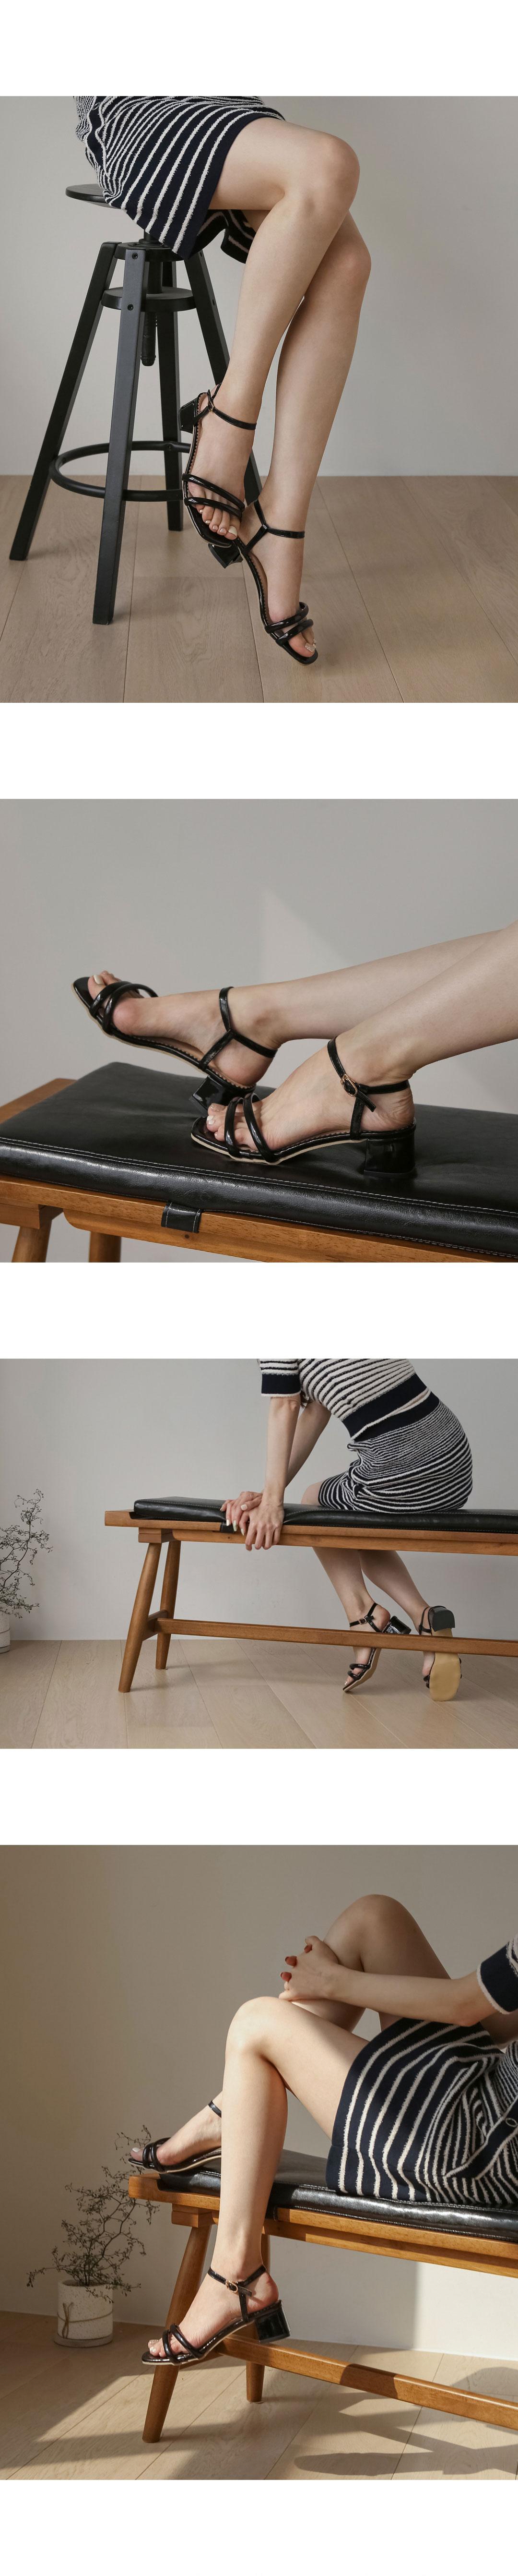 Blier Whole Heel Strap Sandal Heel SDEMS2d171